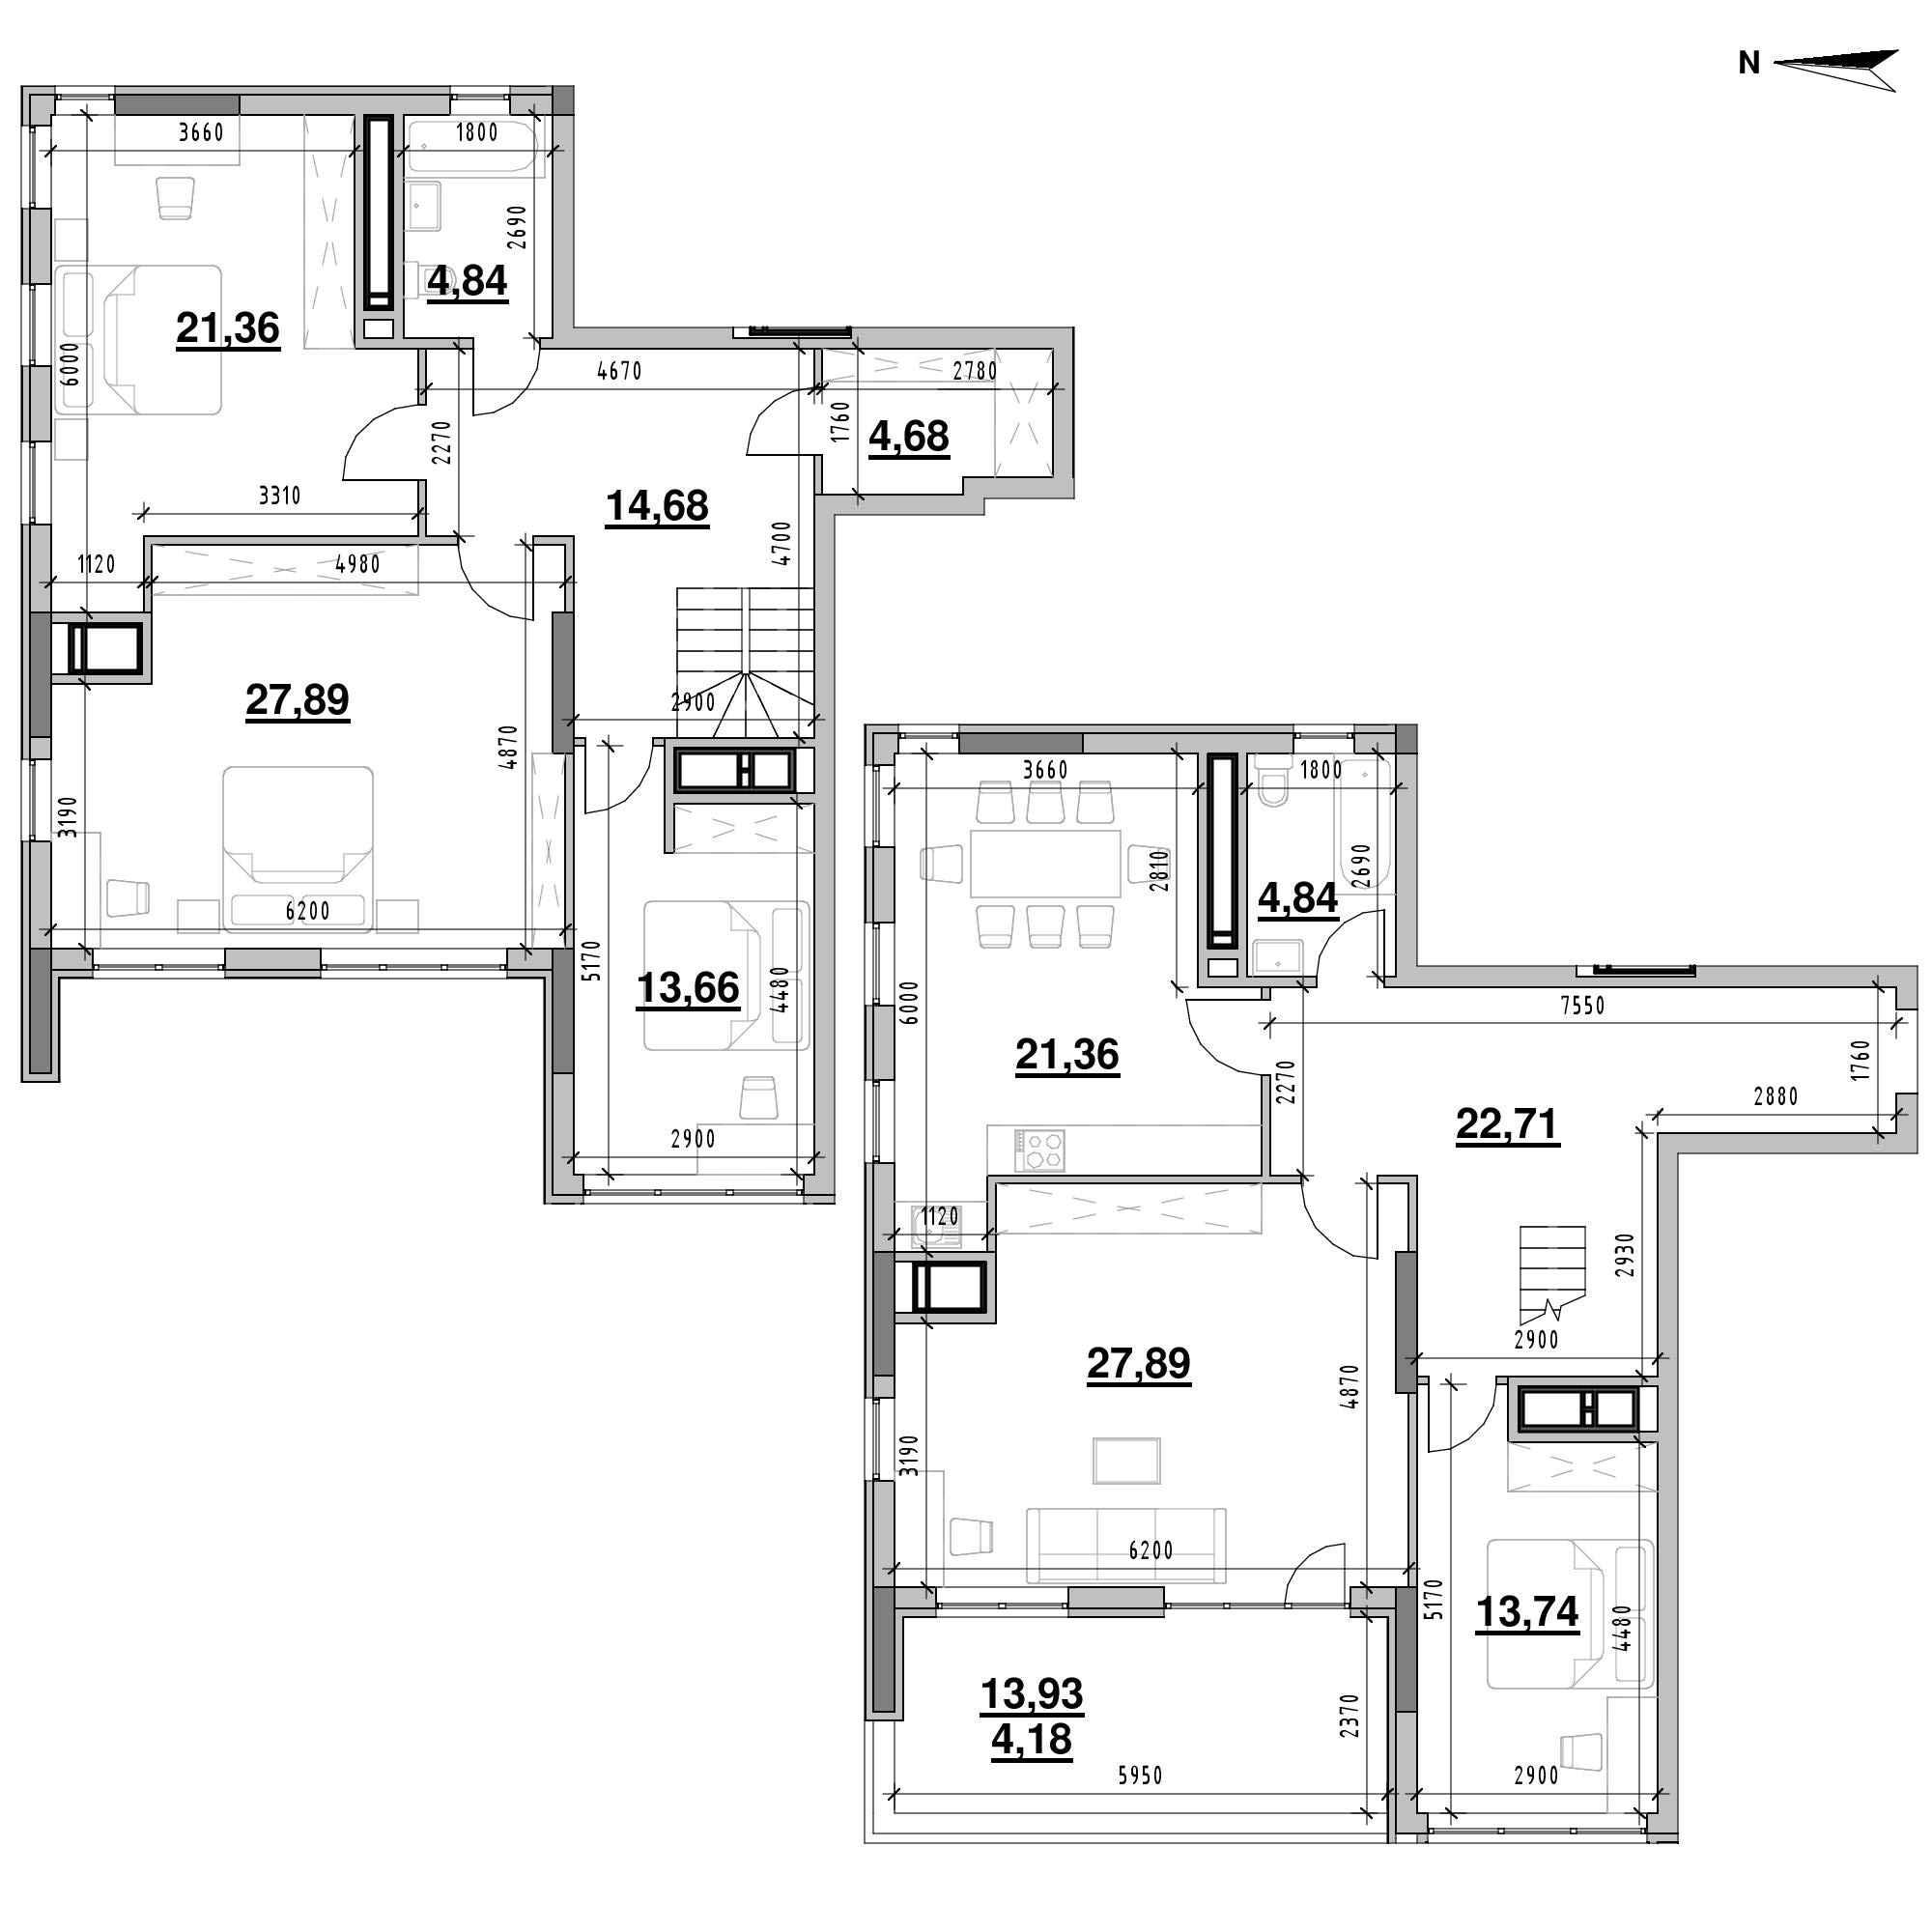 ЖК Nordica Residence: планування 5-кімнатної квартири, №214, 181.83 м<sup>2</sup>